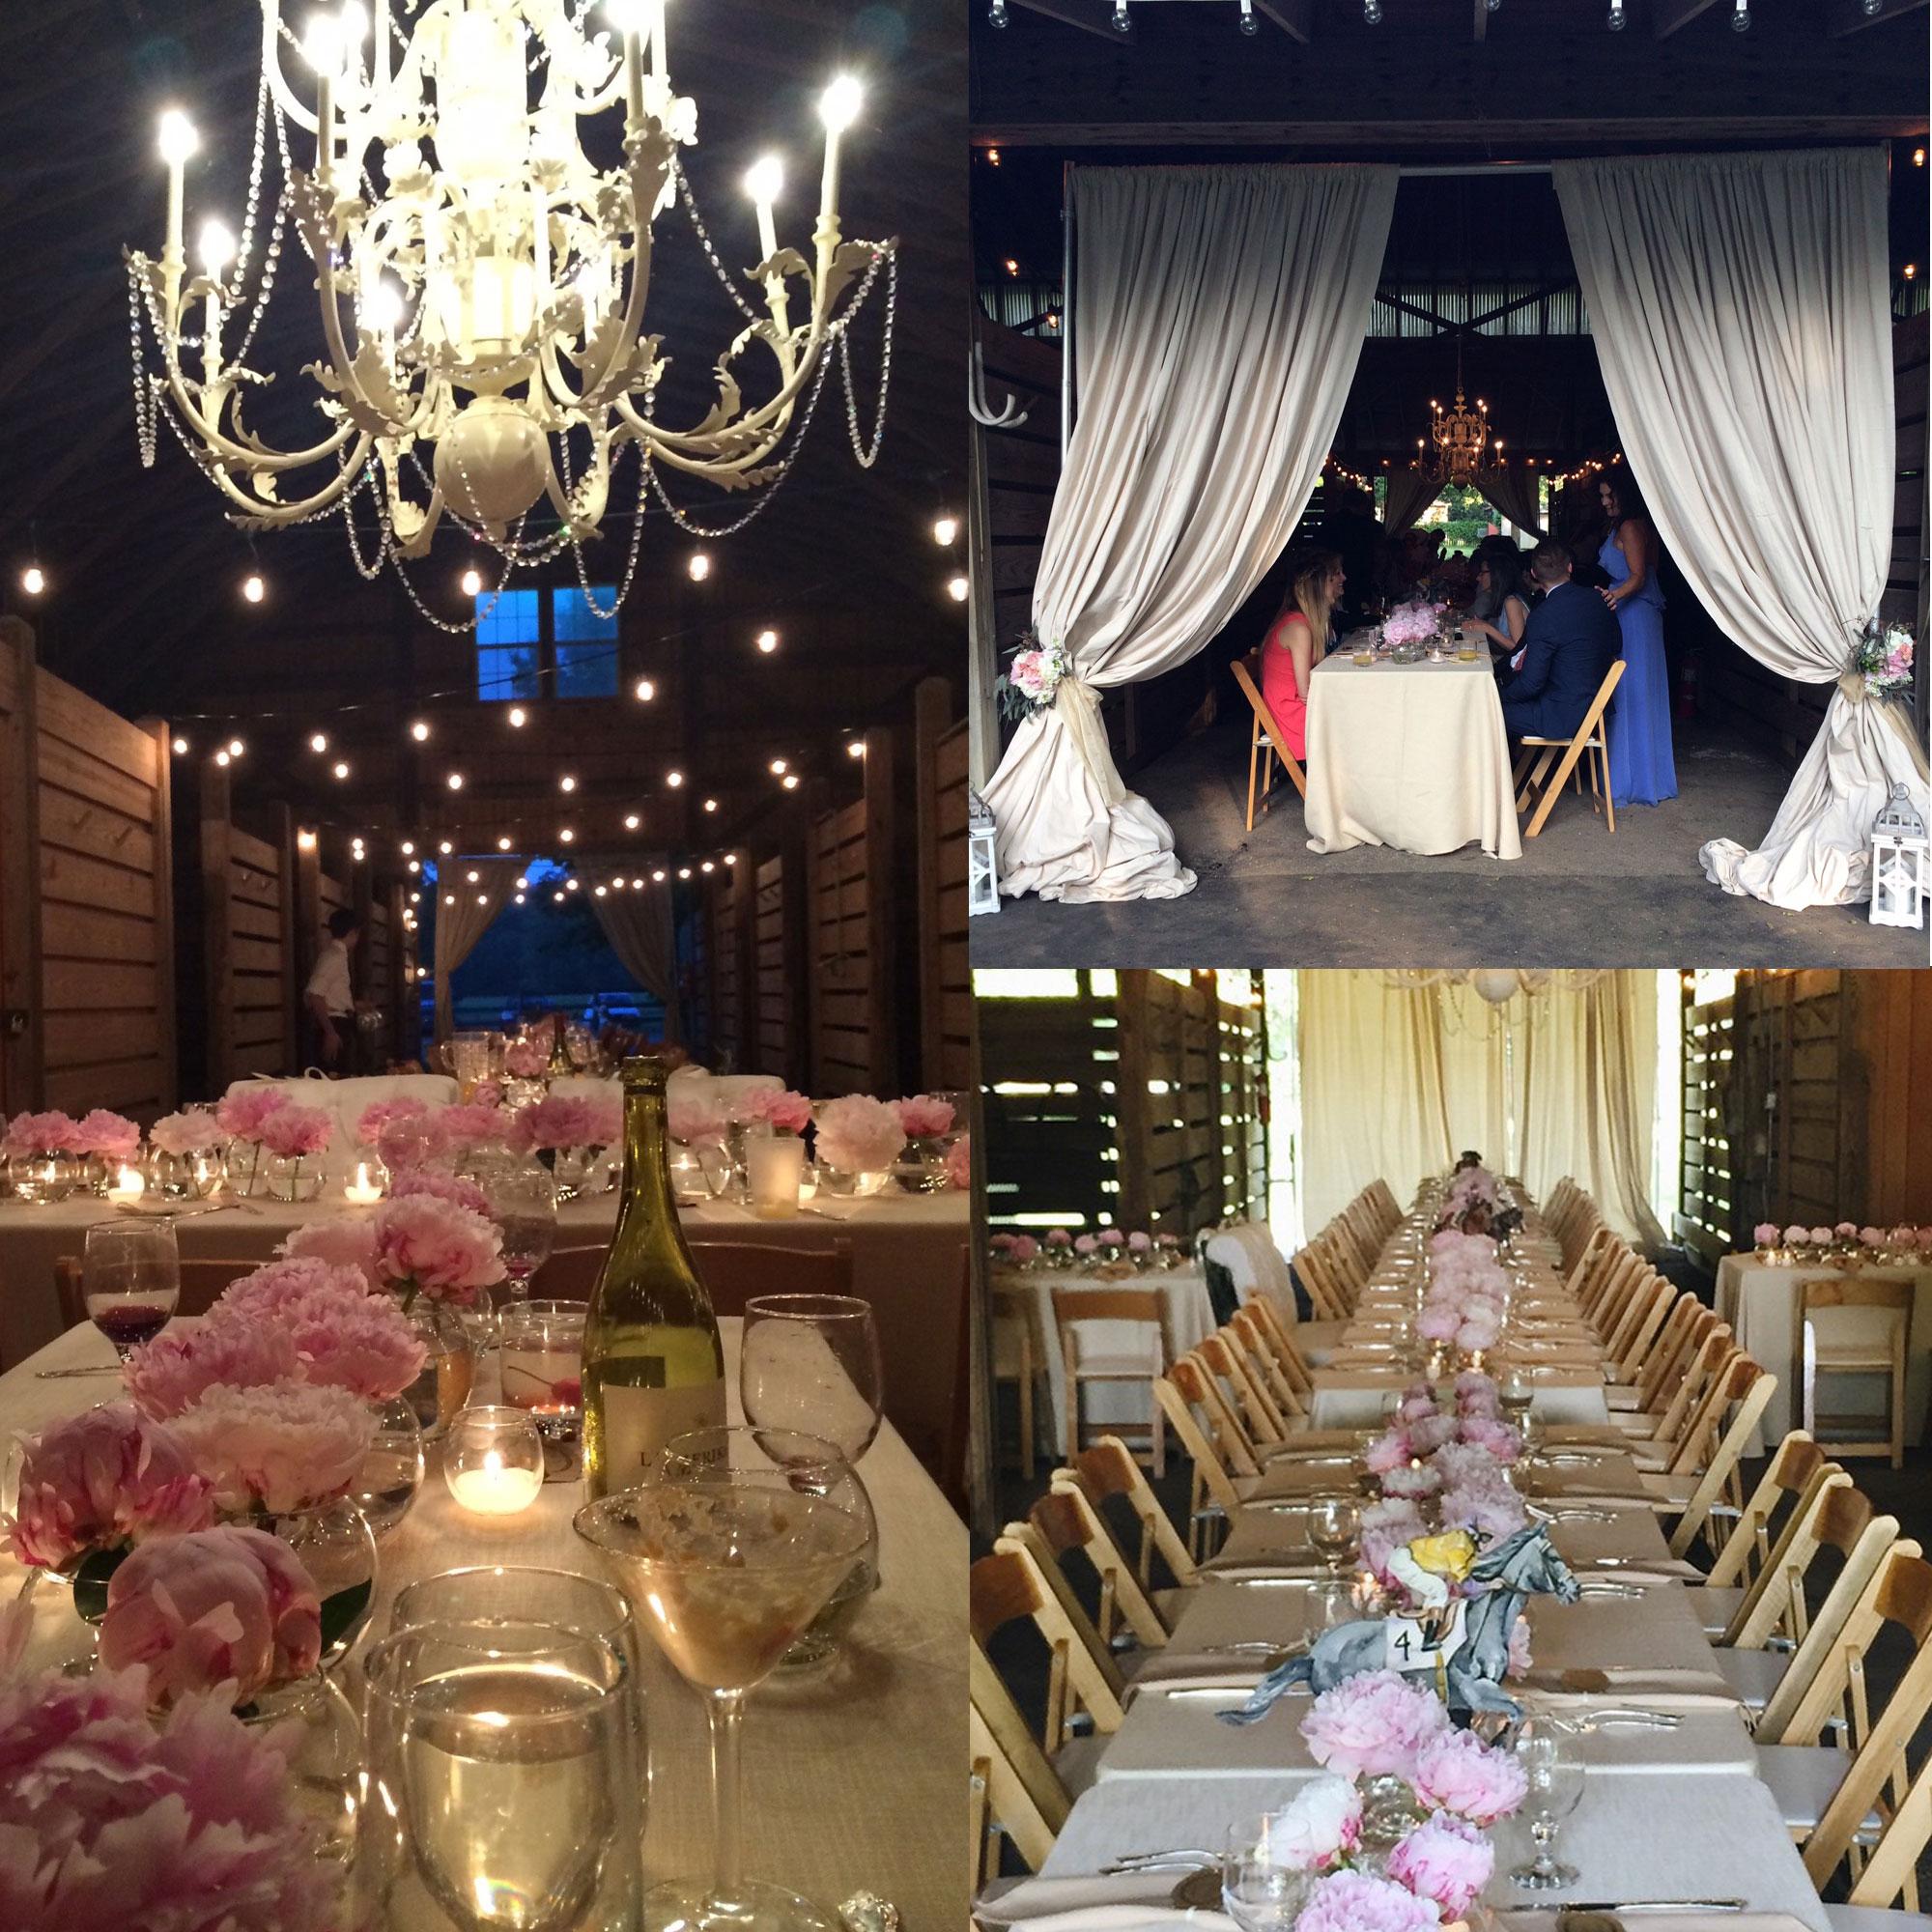 Polo Barns at Saxony, Farm Wedding, Barn Reception, Farm Tables, Peonies, Chandelier in the Barn!